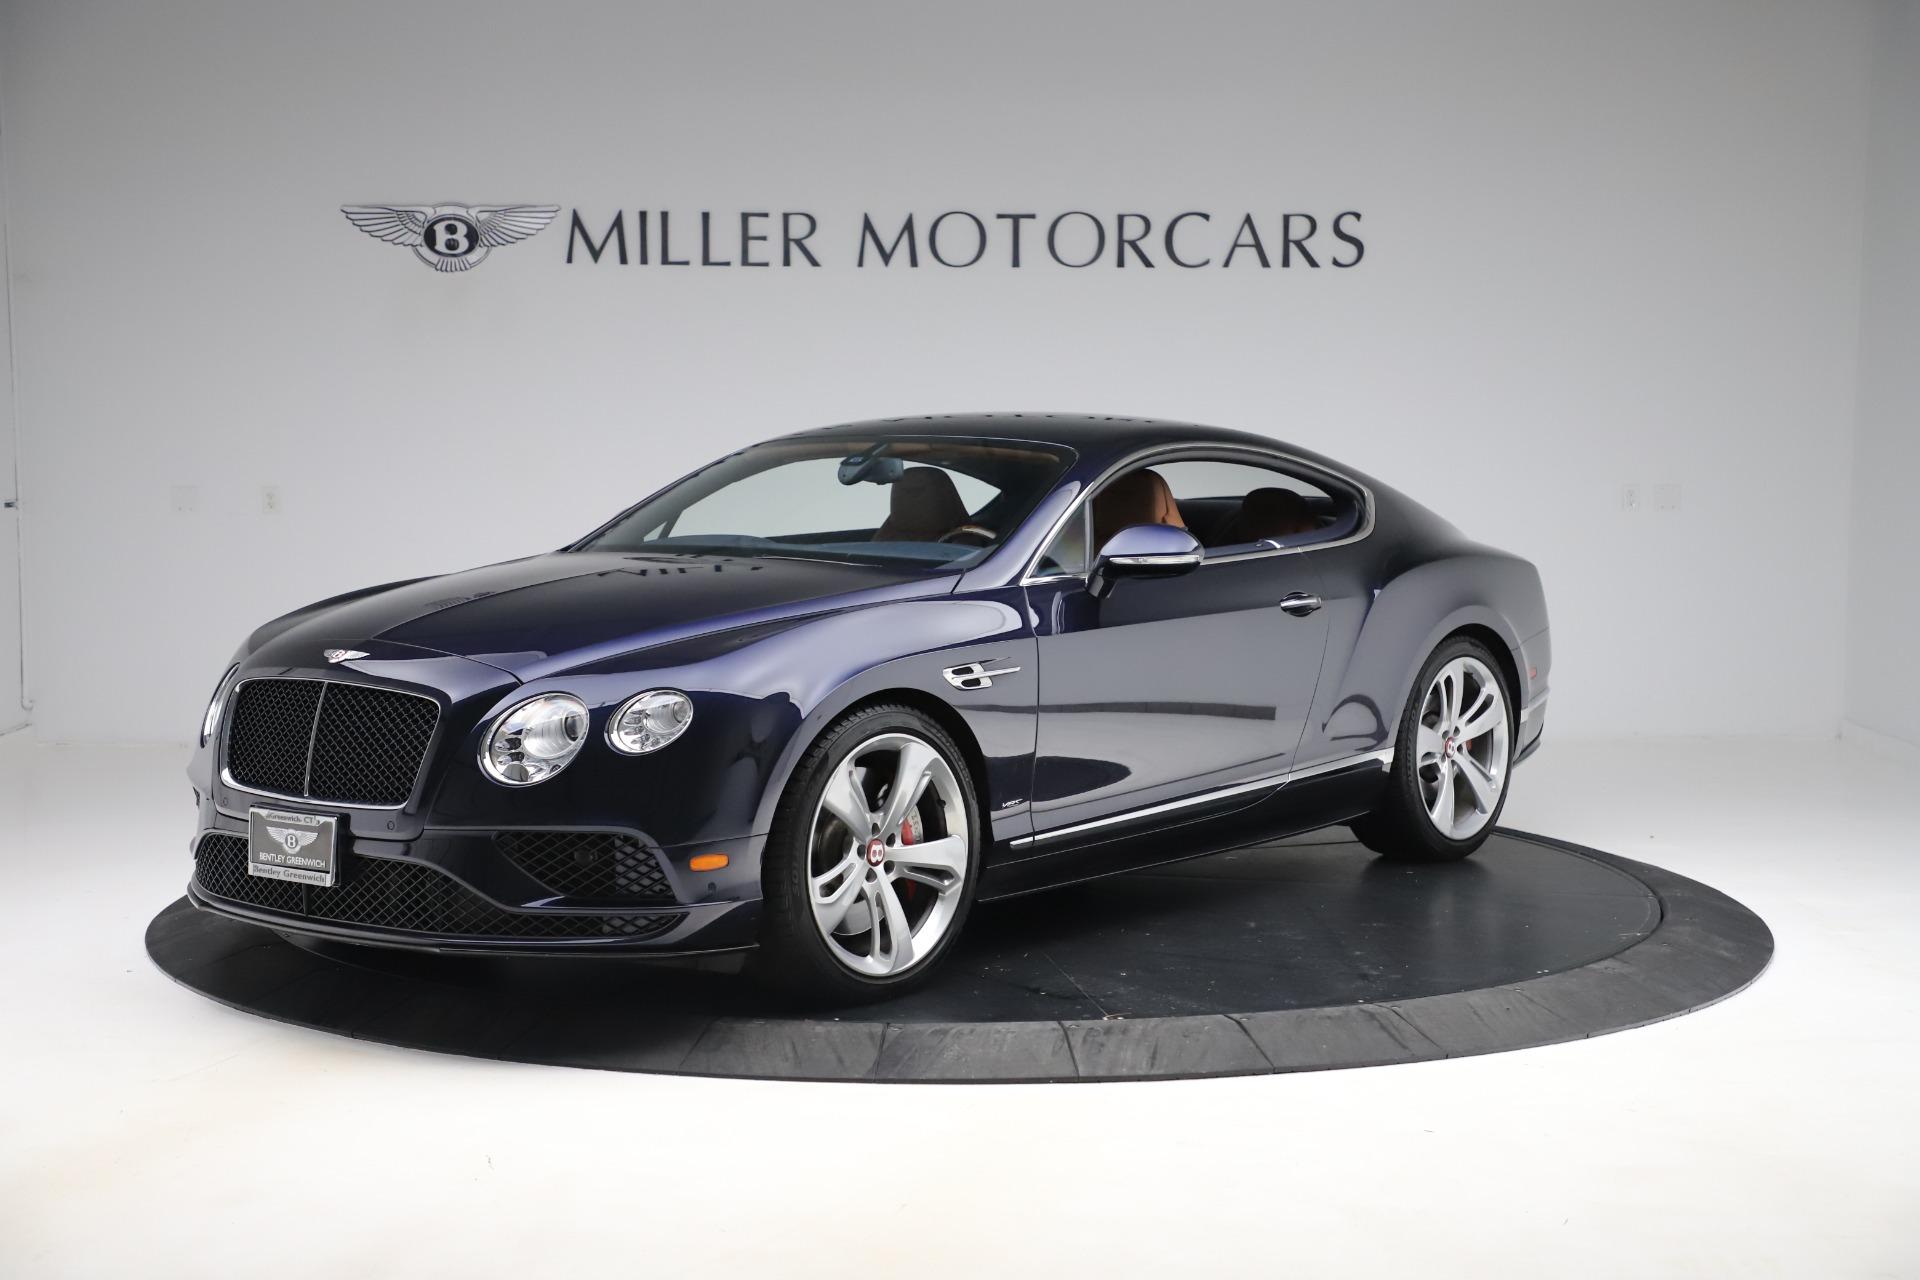 New 2017 Bentley Continental GT V8 S For Sale In Westport, CT 503_main